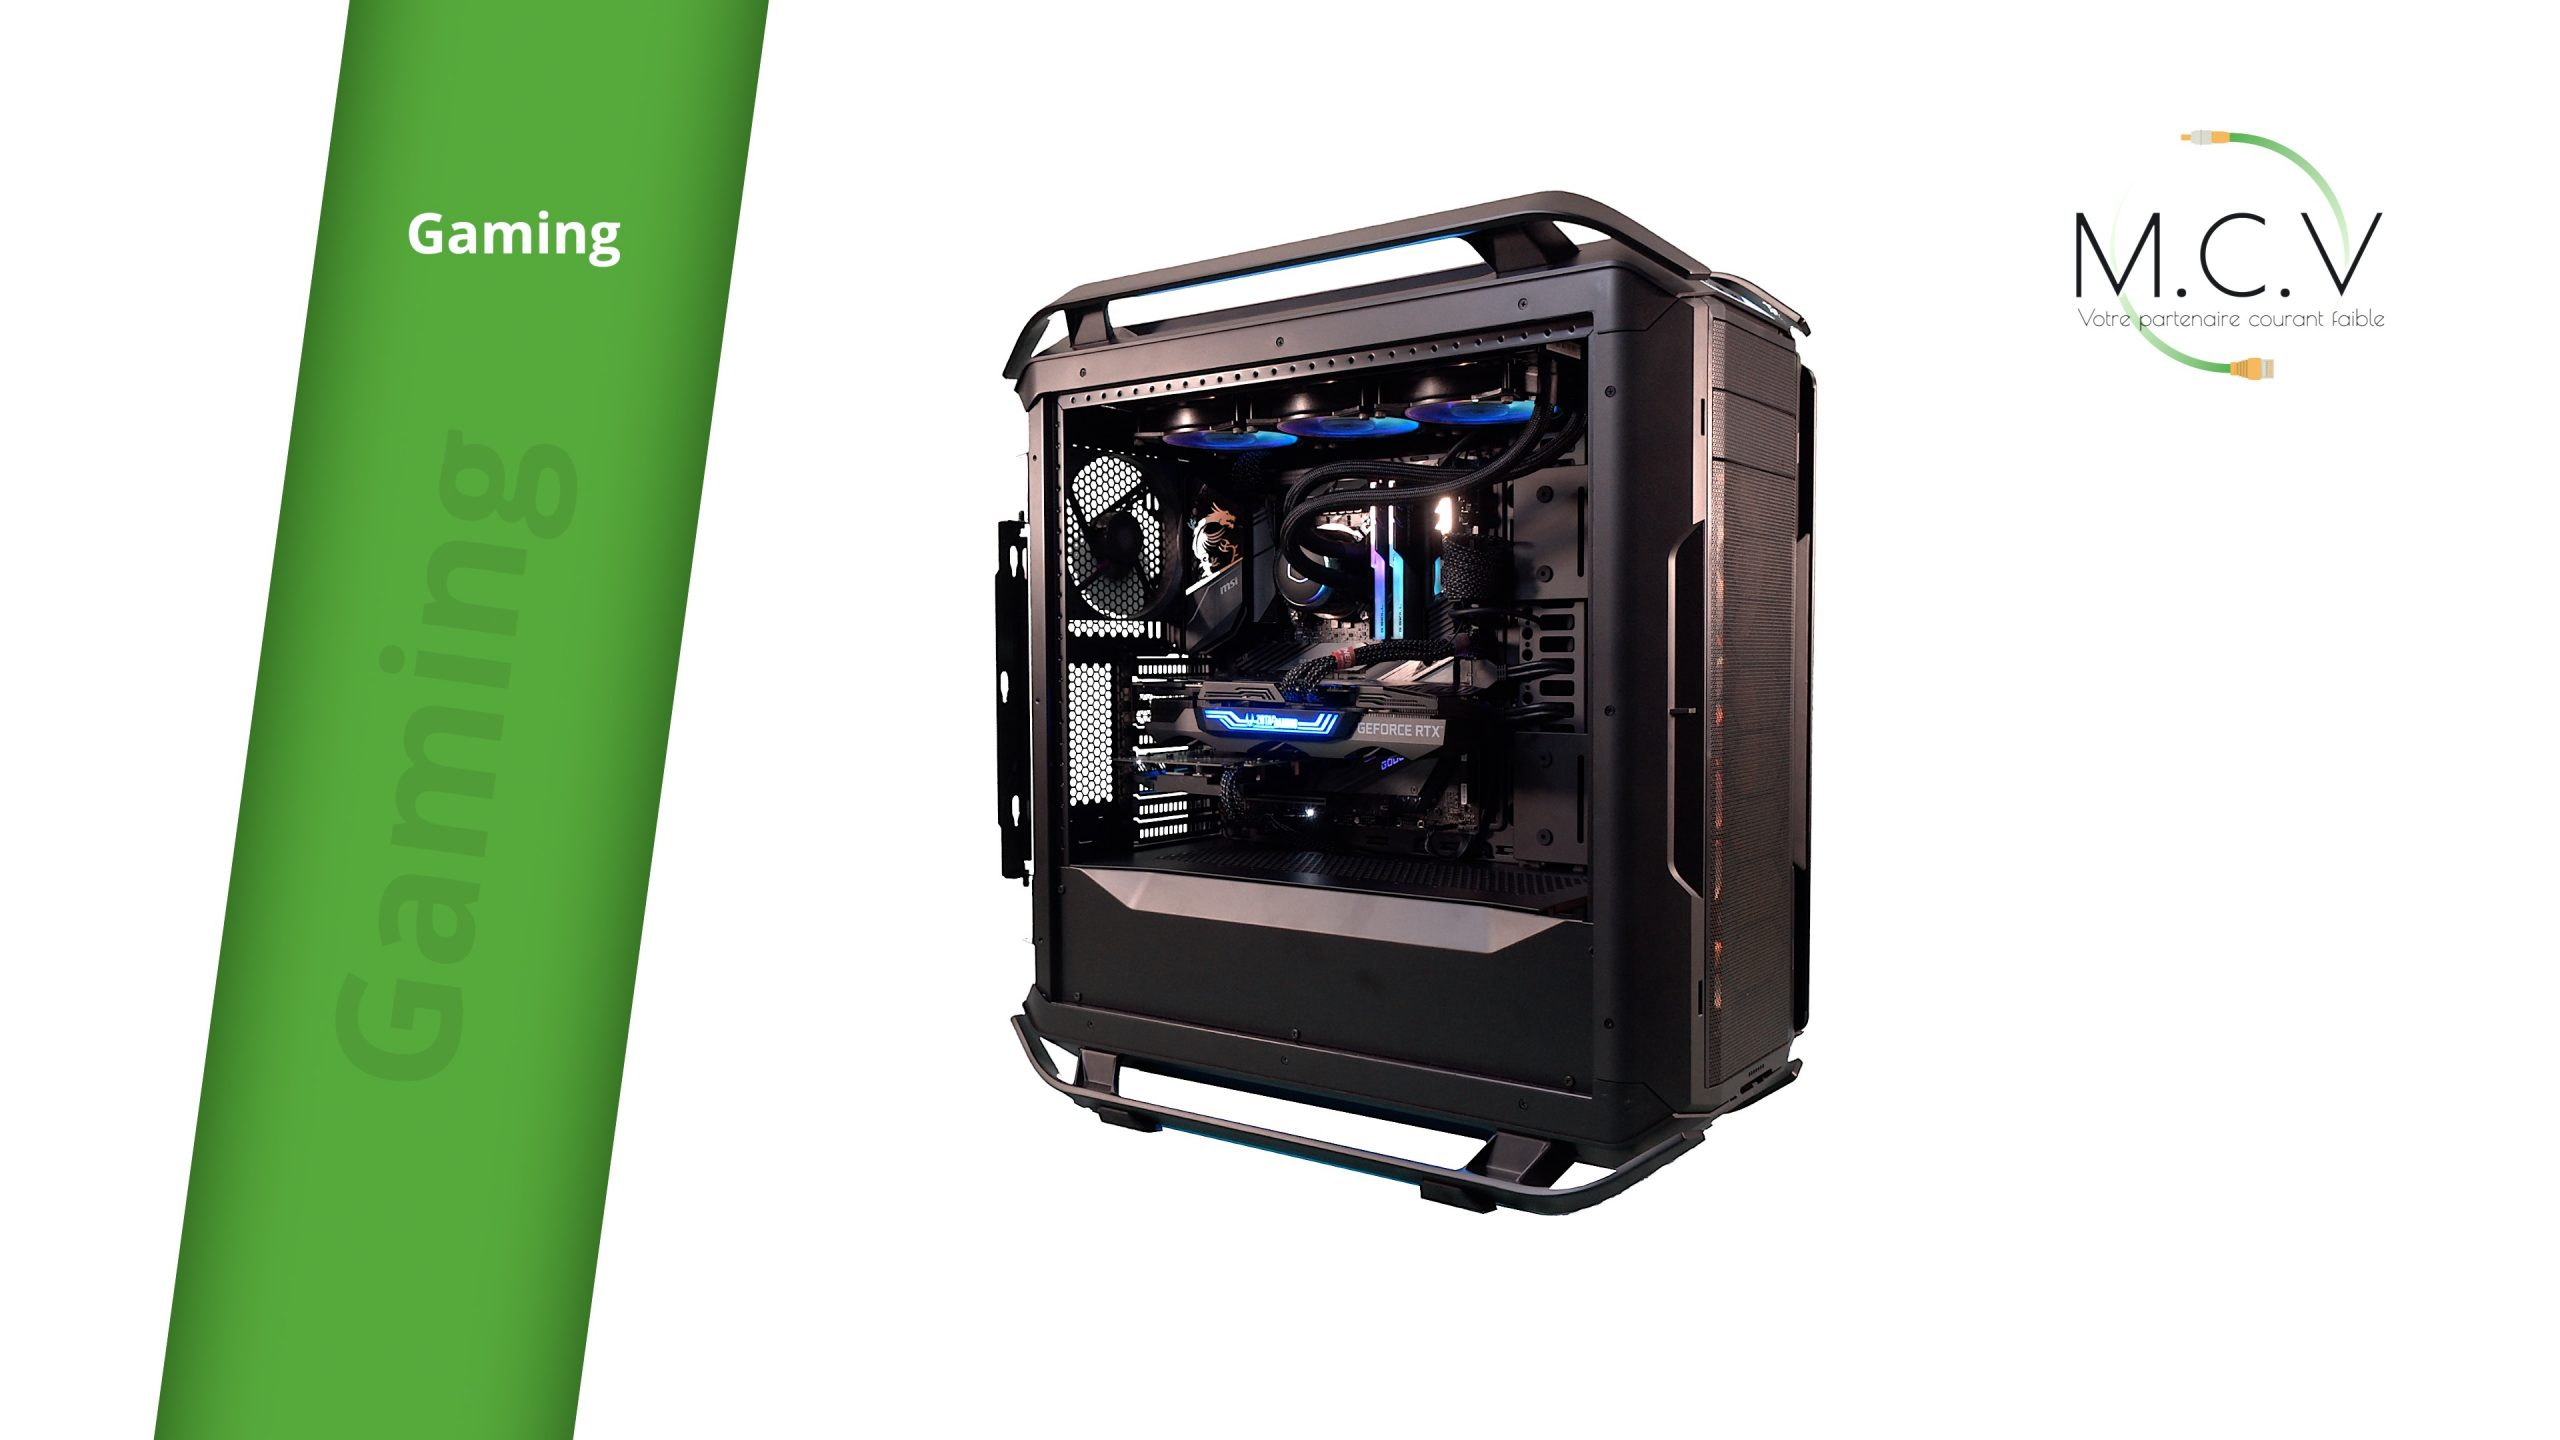 assemblage PC MCV bureautique gaming serveur montage video speed